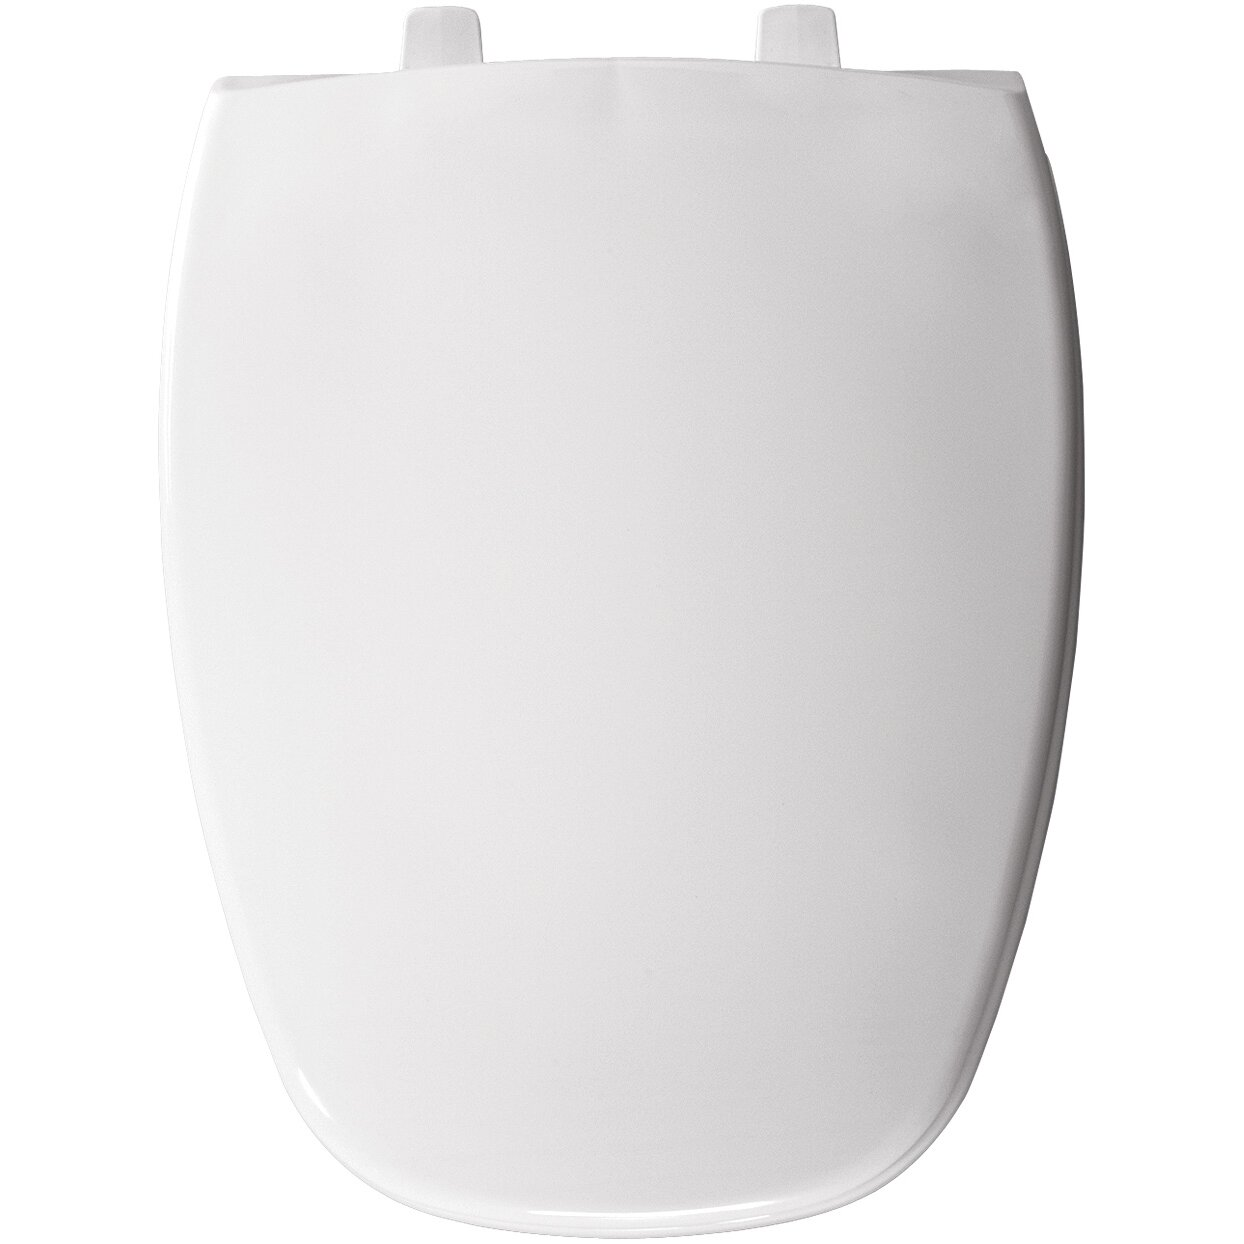 Bemis Eljer Molded Emblem Solid Plastic Elongated Toilet Seat Reviews